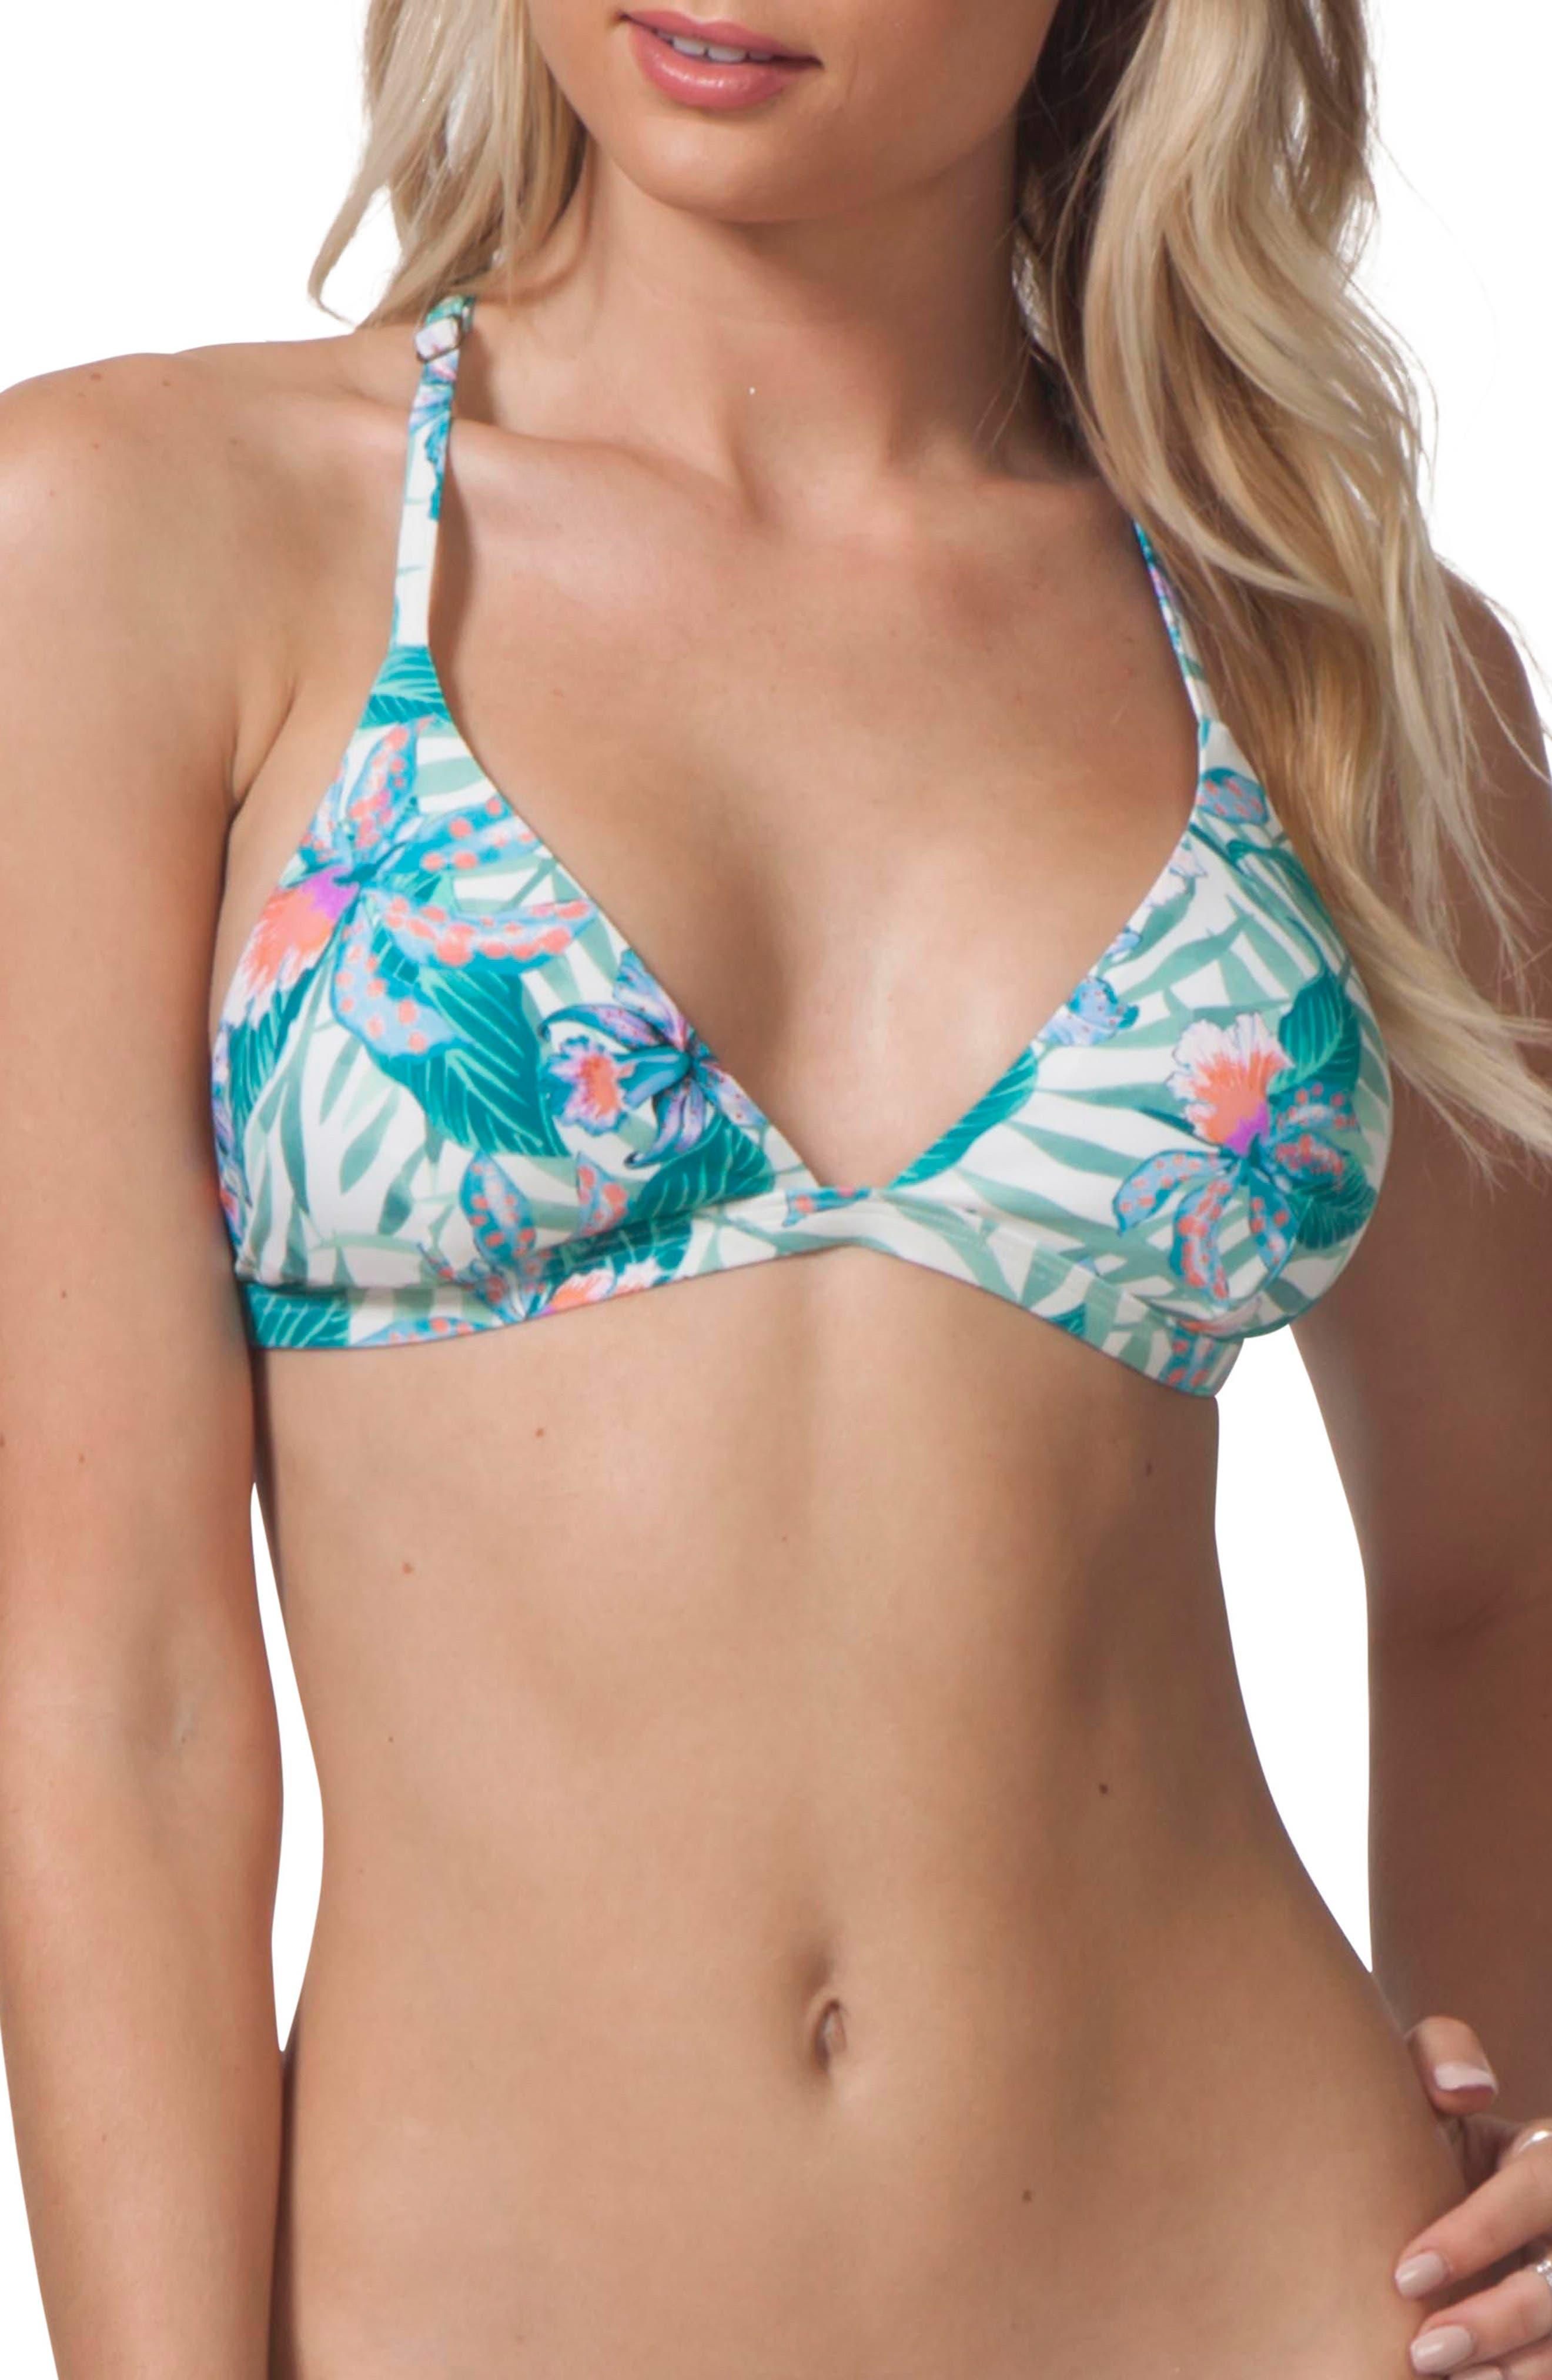 Tropic Tribe Triangle Bikini Top,                         Main,                         color, 100